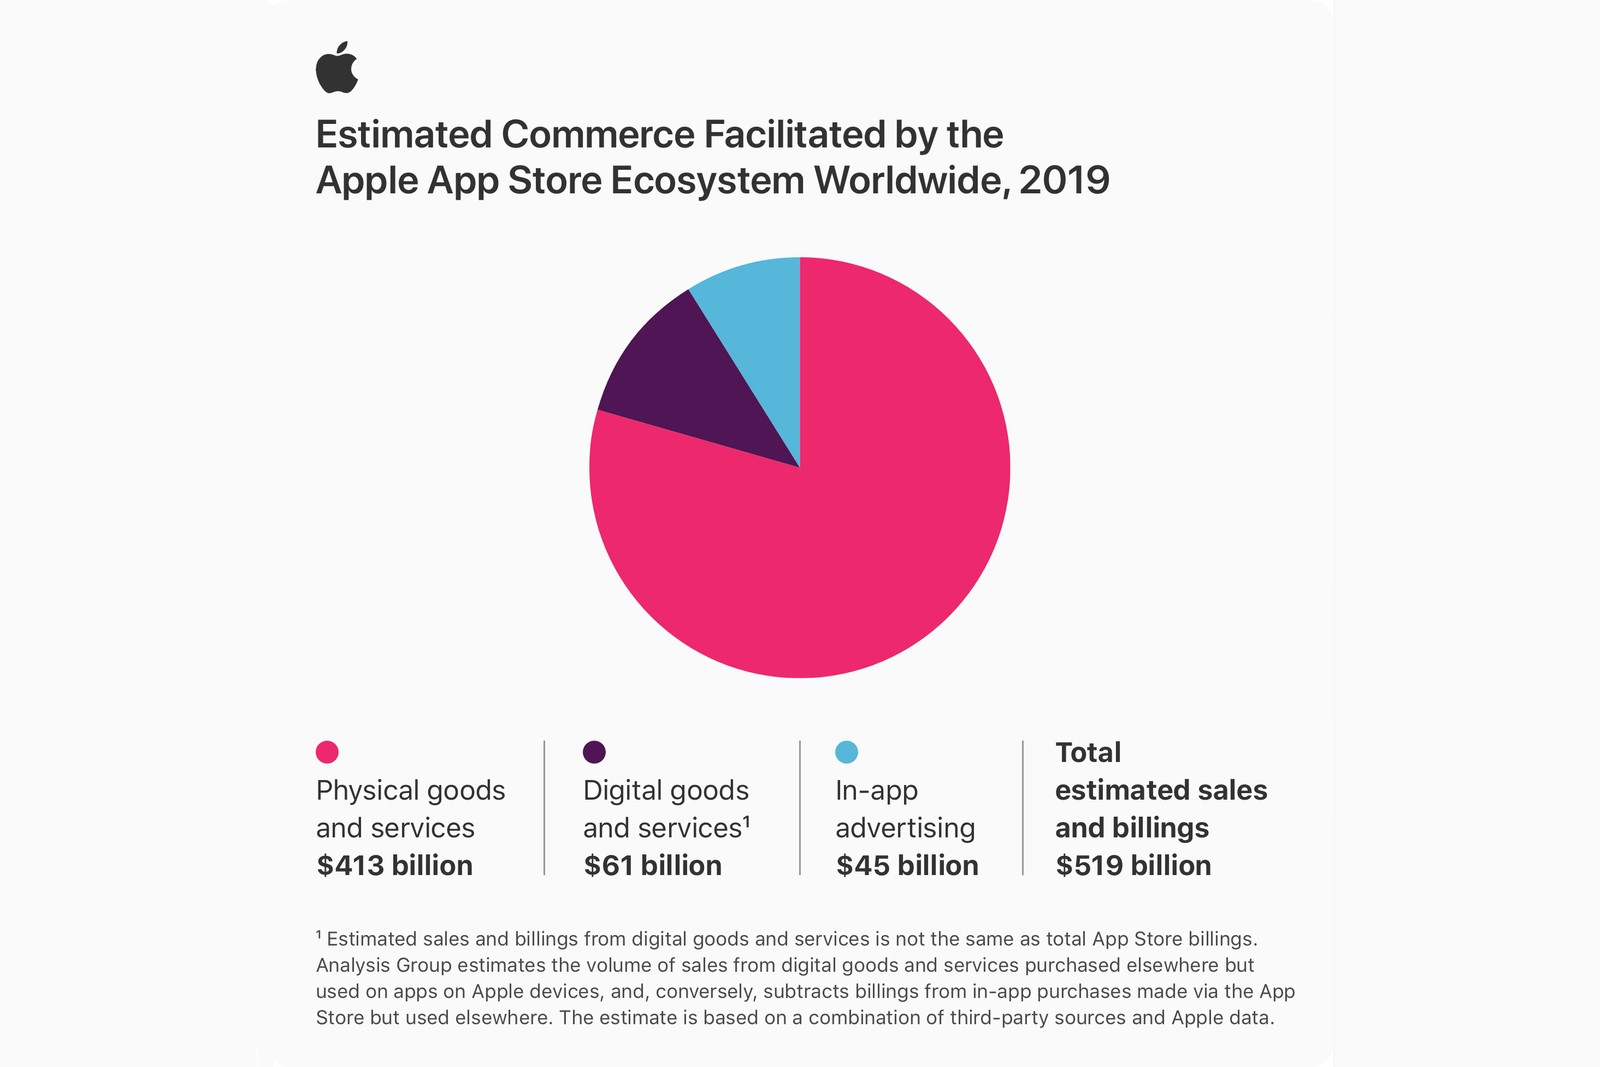 Apple 公佈其 App Store 生態系統於去年帶動超過 5,000 億美元商貿交易